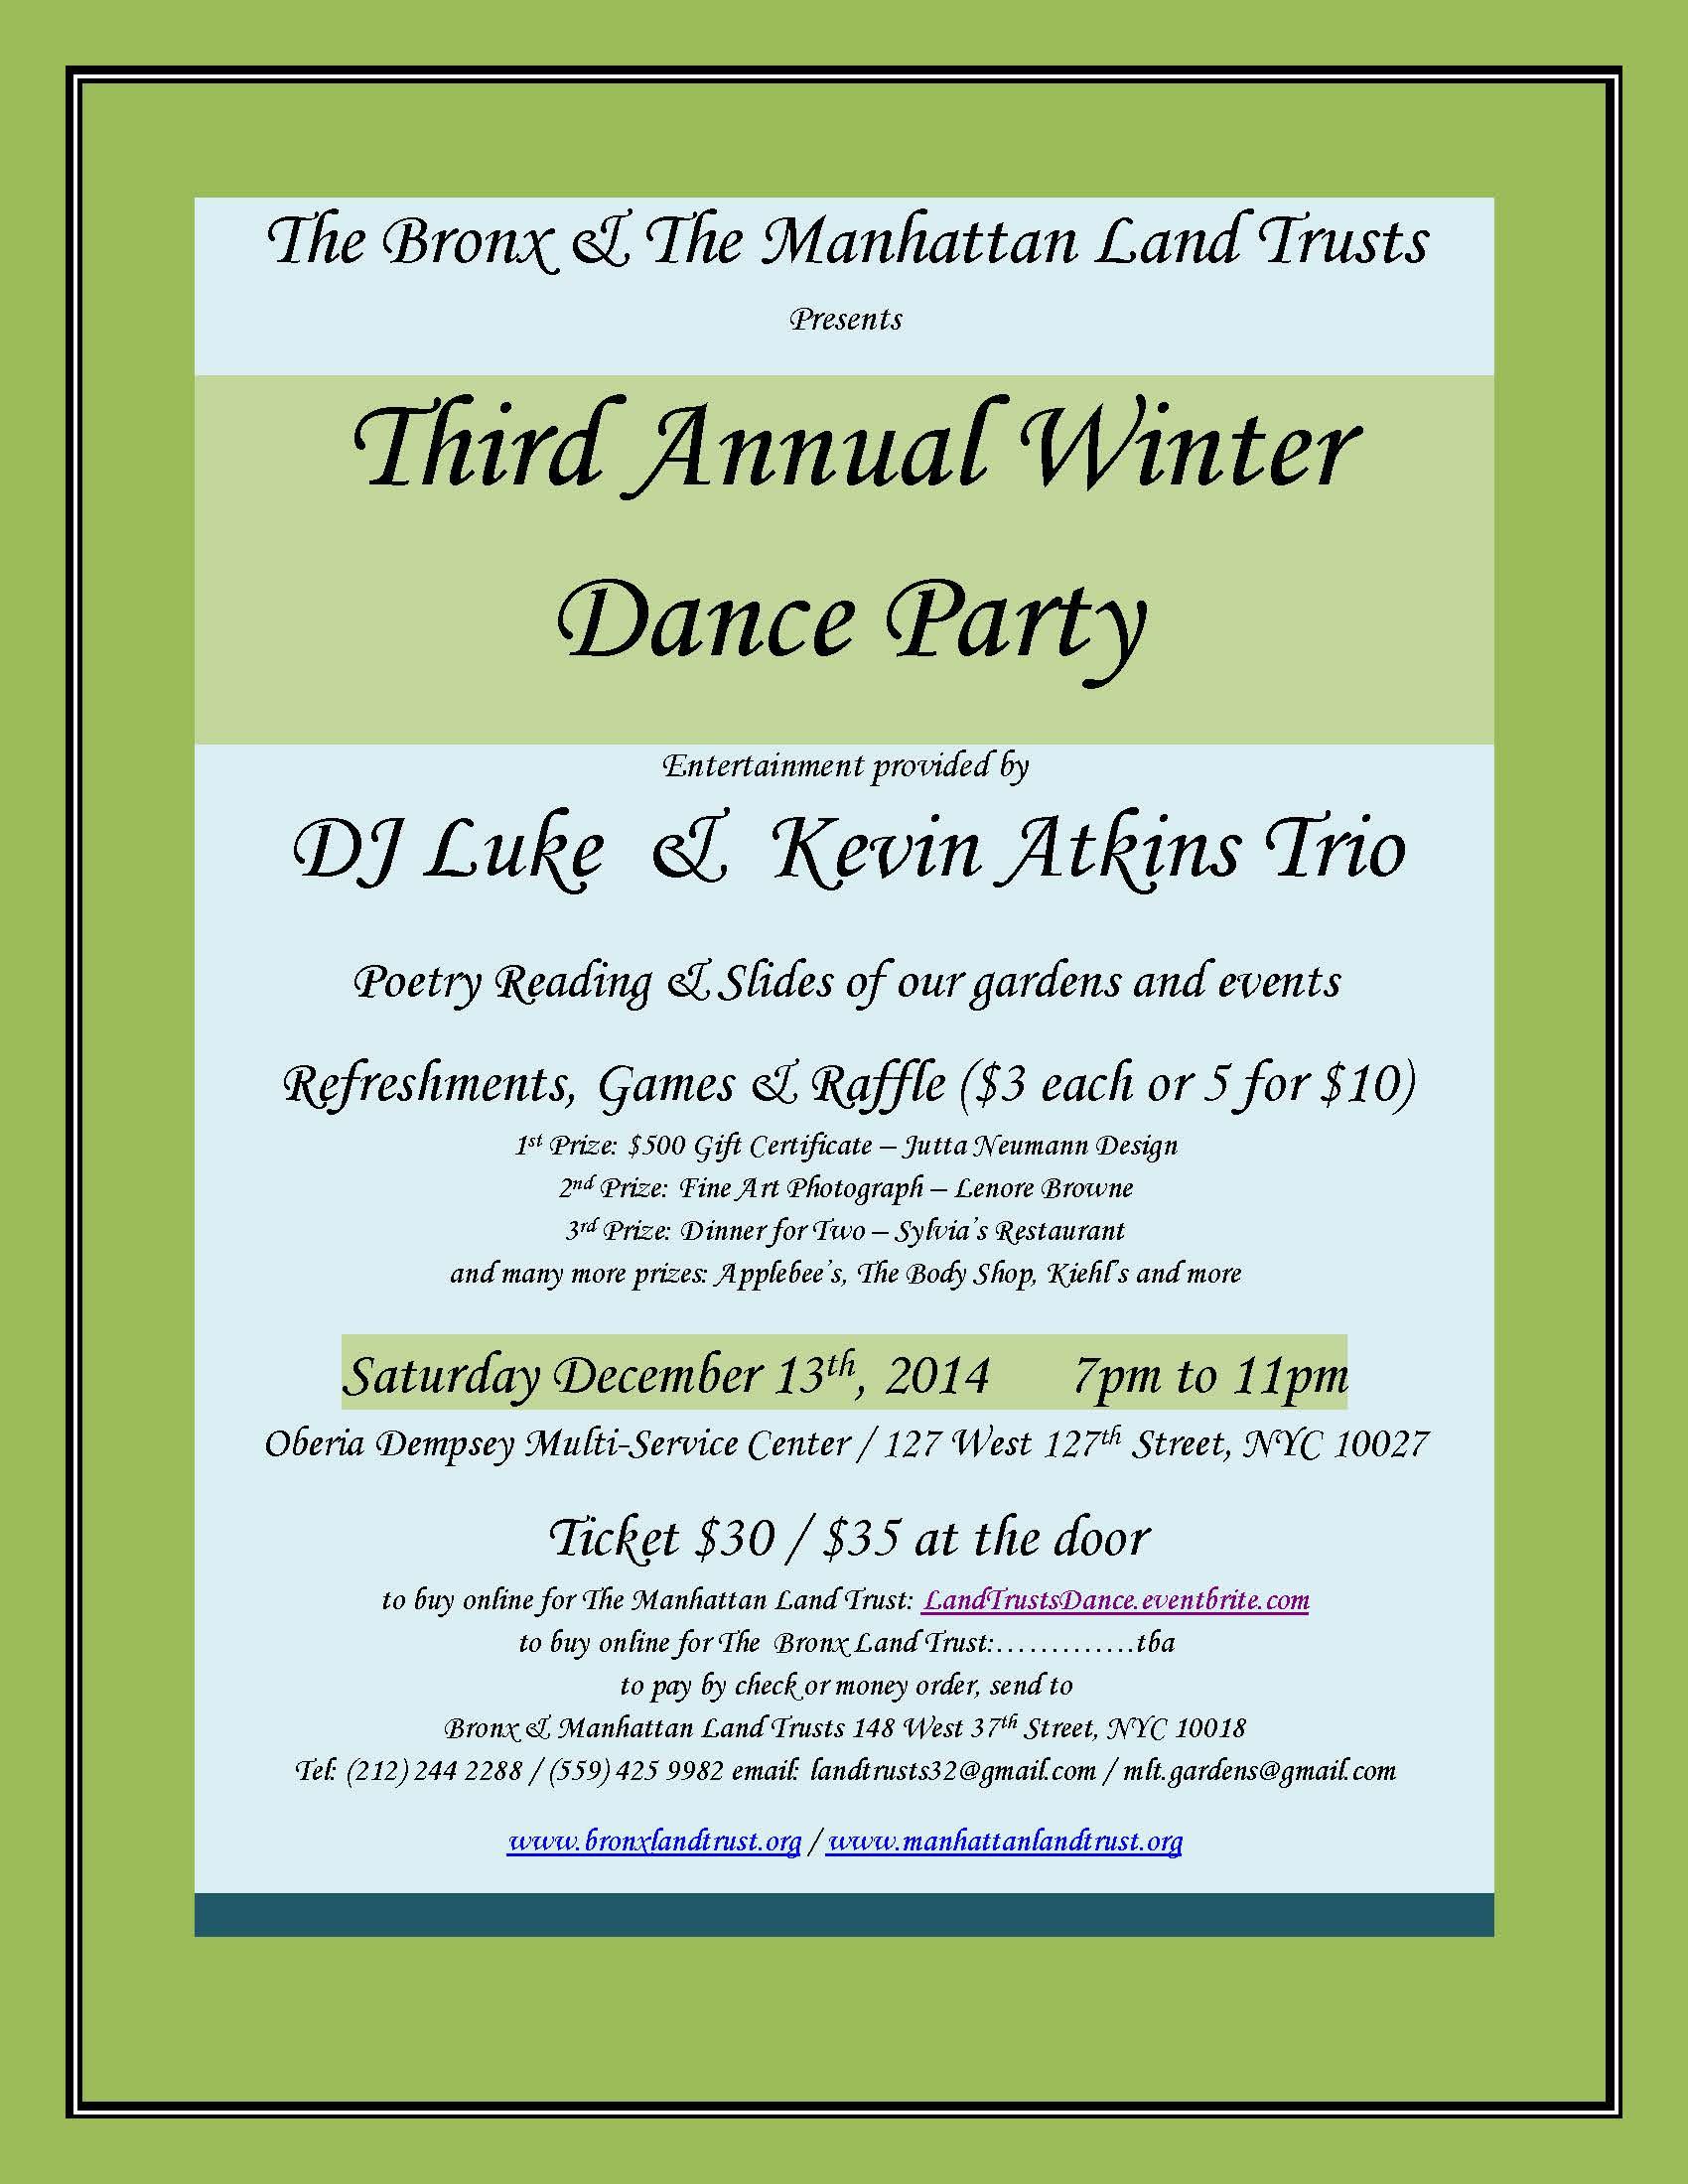 MLT & BLT 2014 Winter Dance Party December 13th